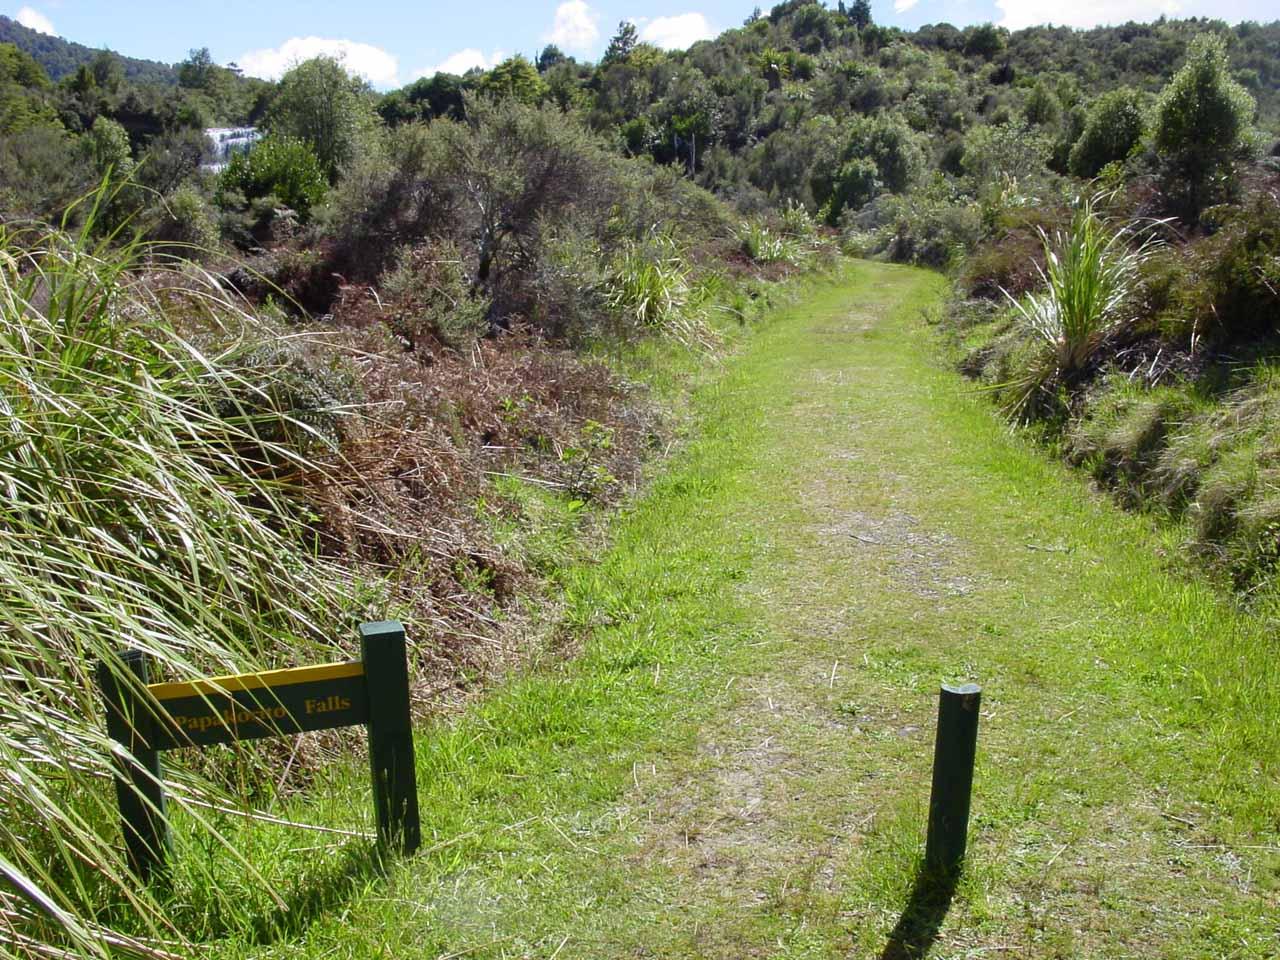 Start of the short 2-minute trail to Papakorito Falls